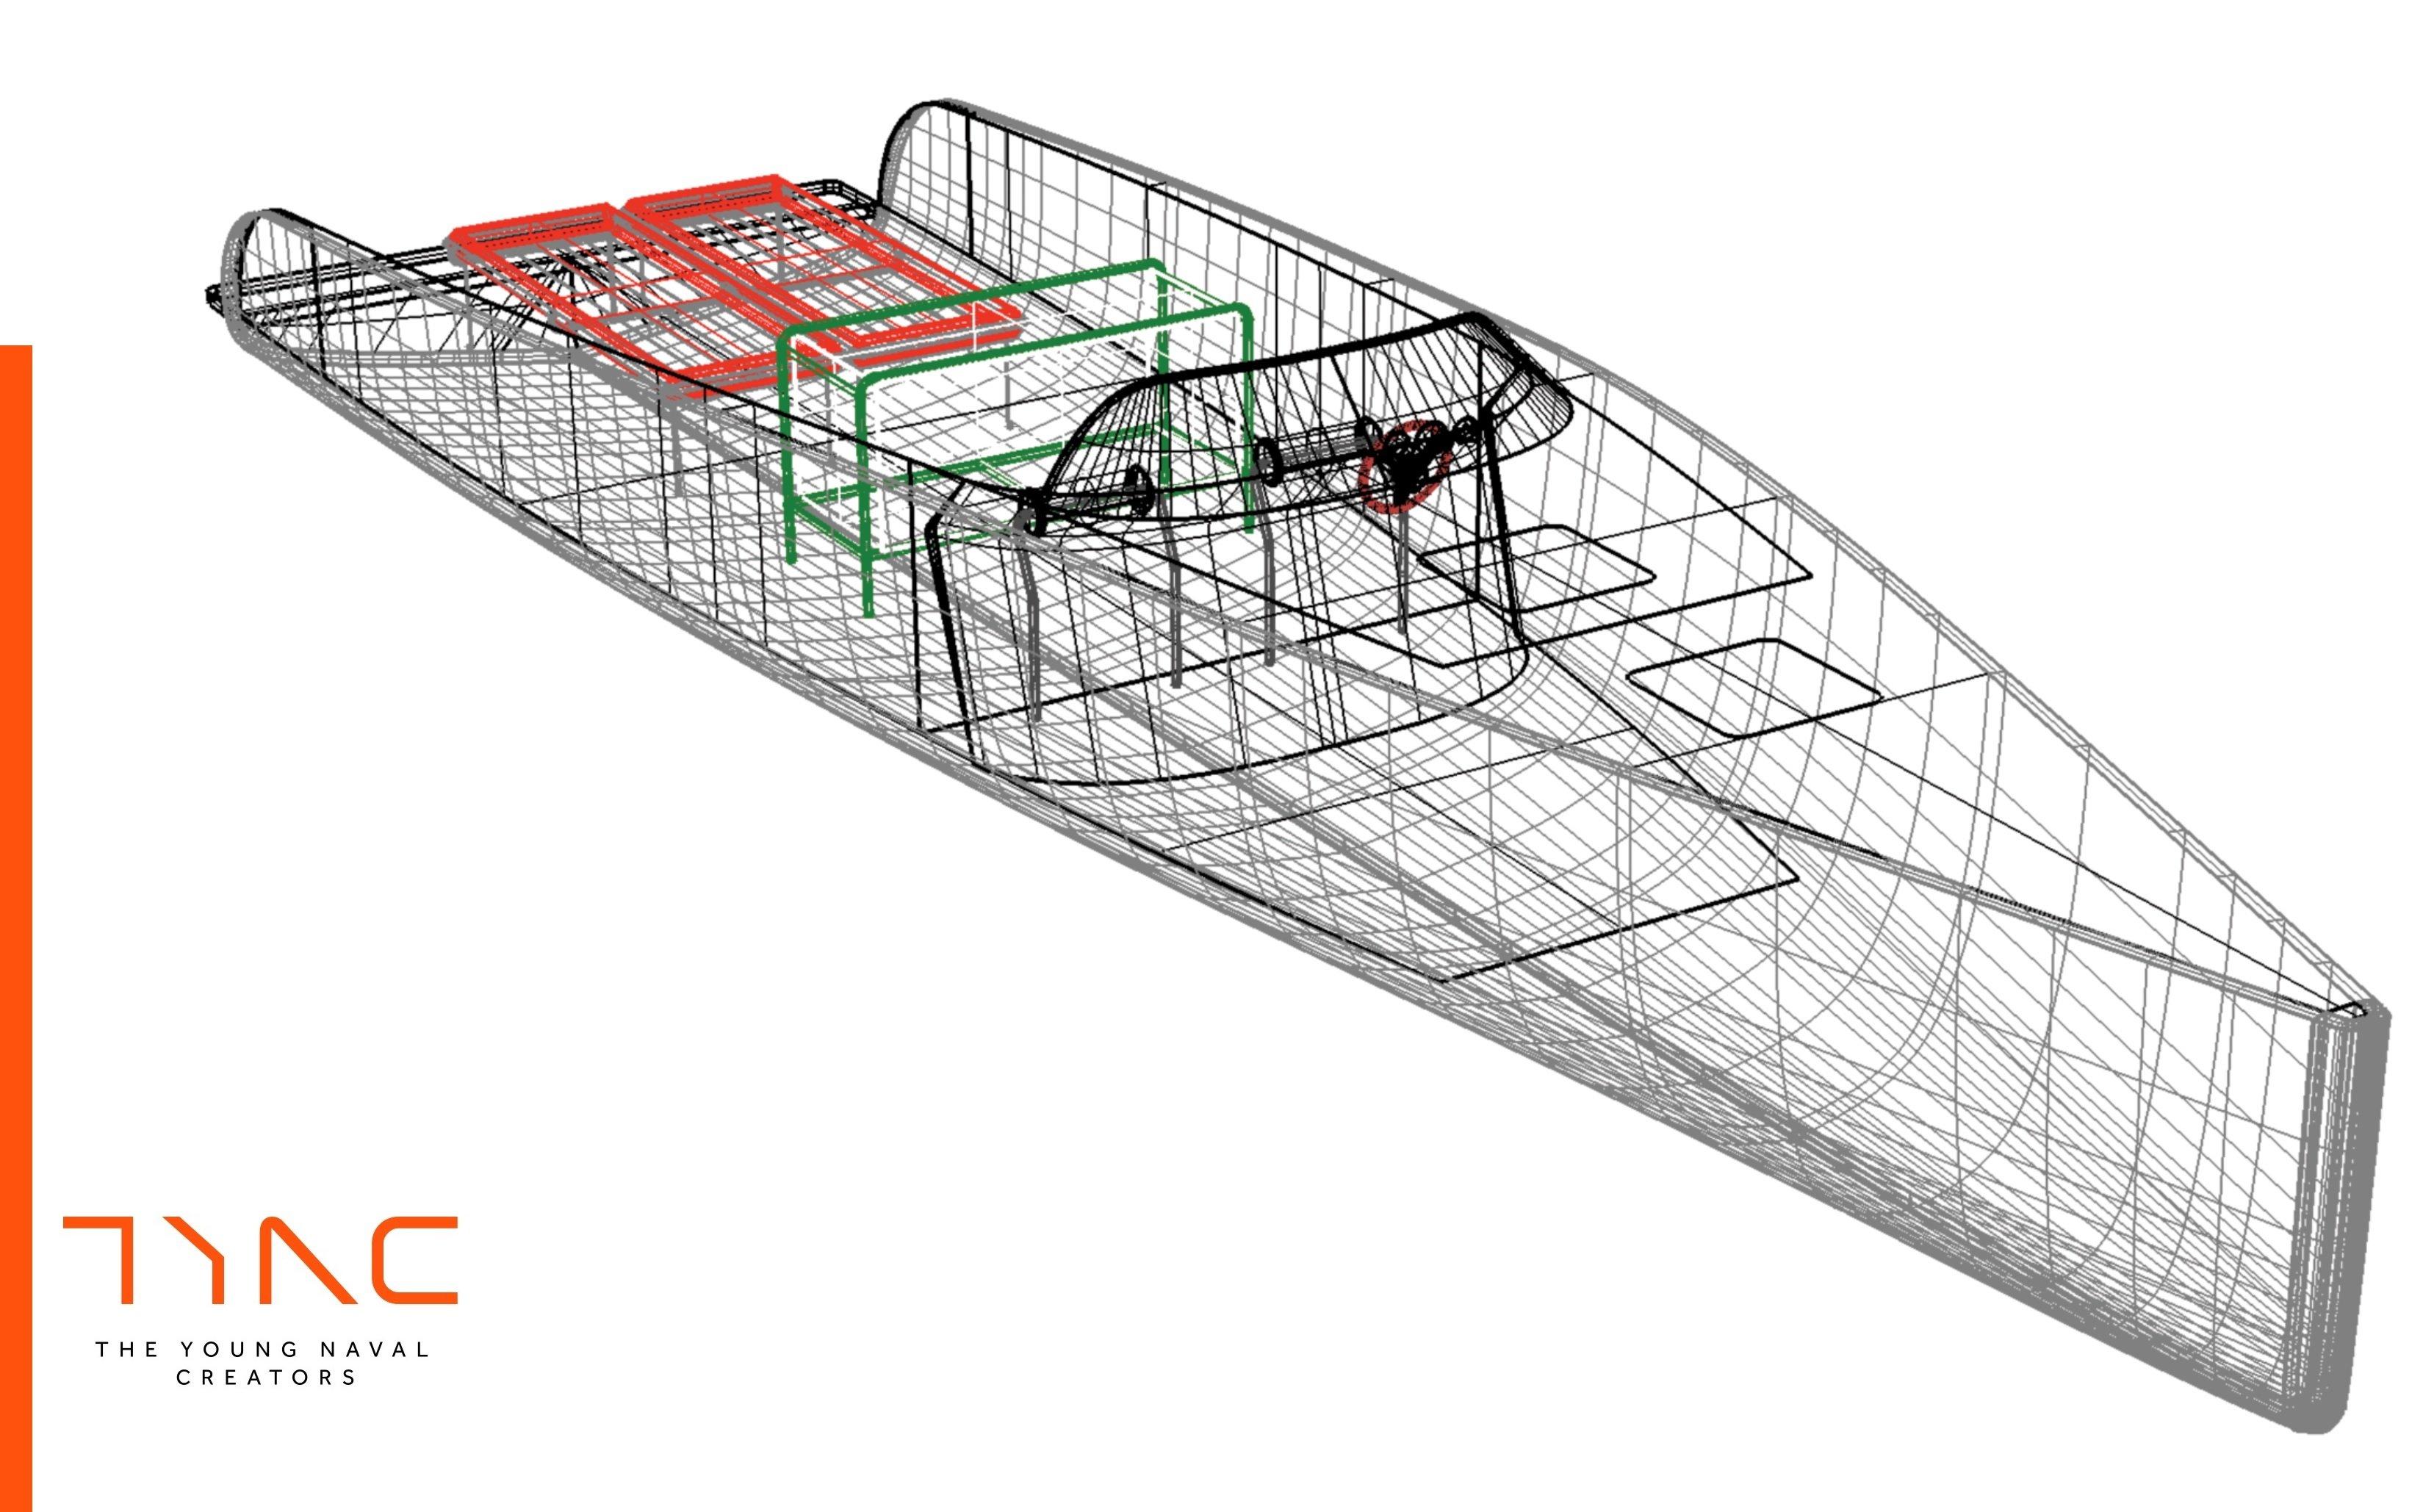 Yacht Design from TYNC